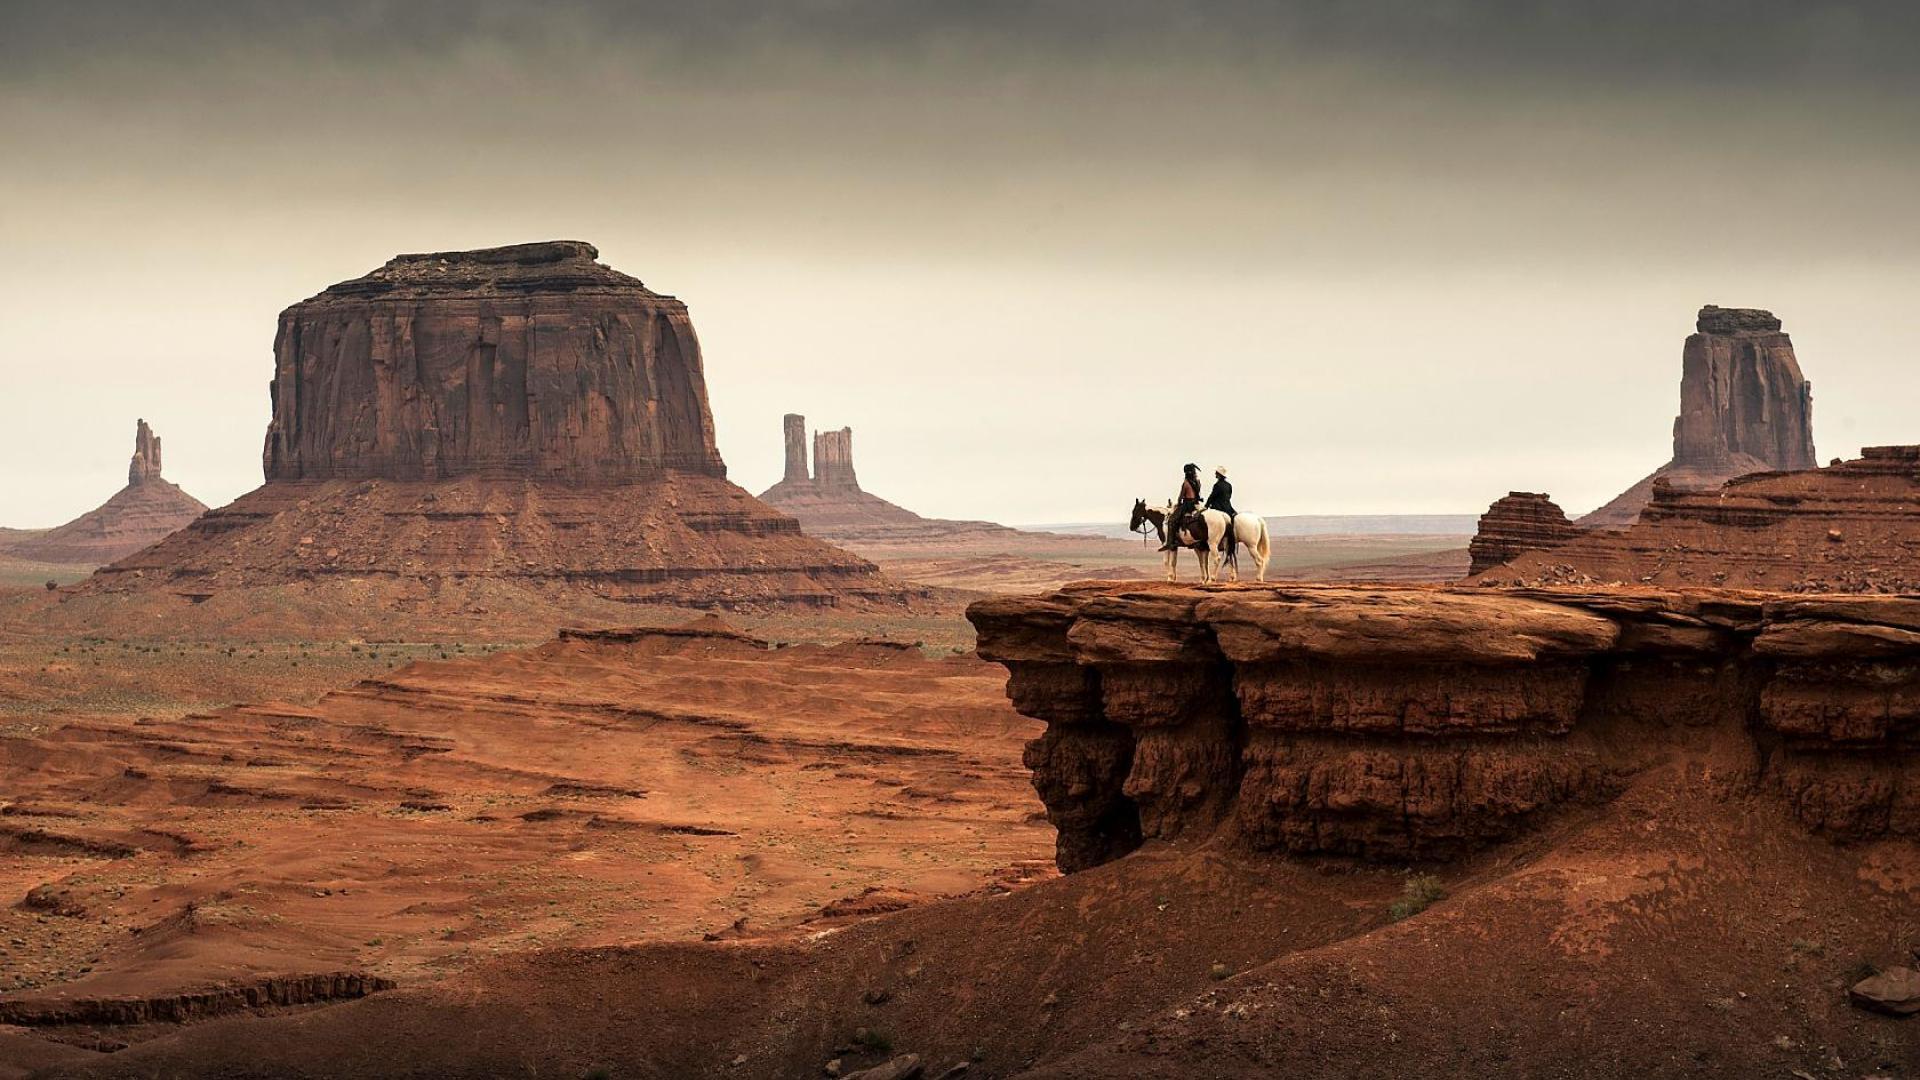 Western Cowboy Scene Desktop Wallpapers   Top Western Cowboy 1920x1080